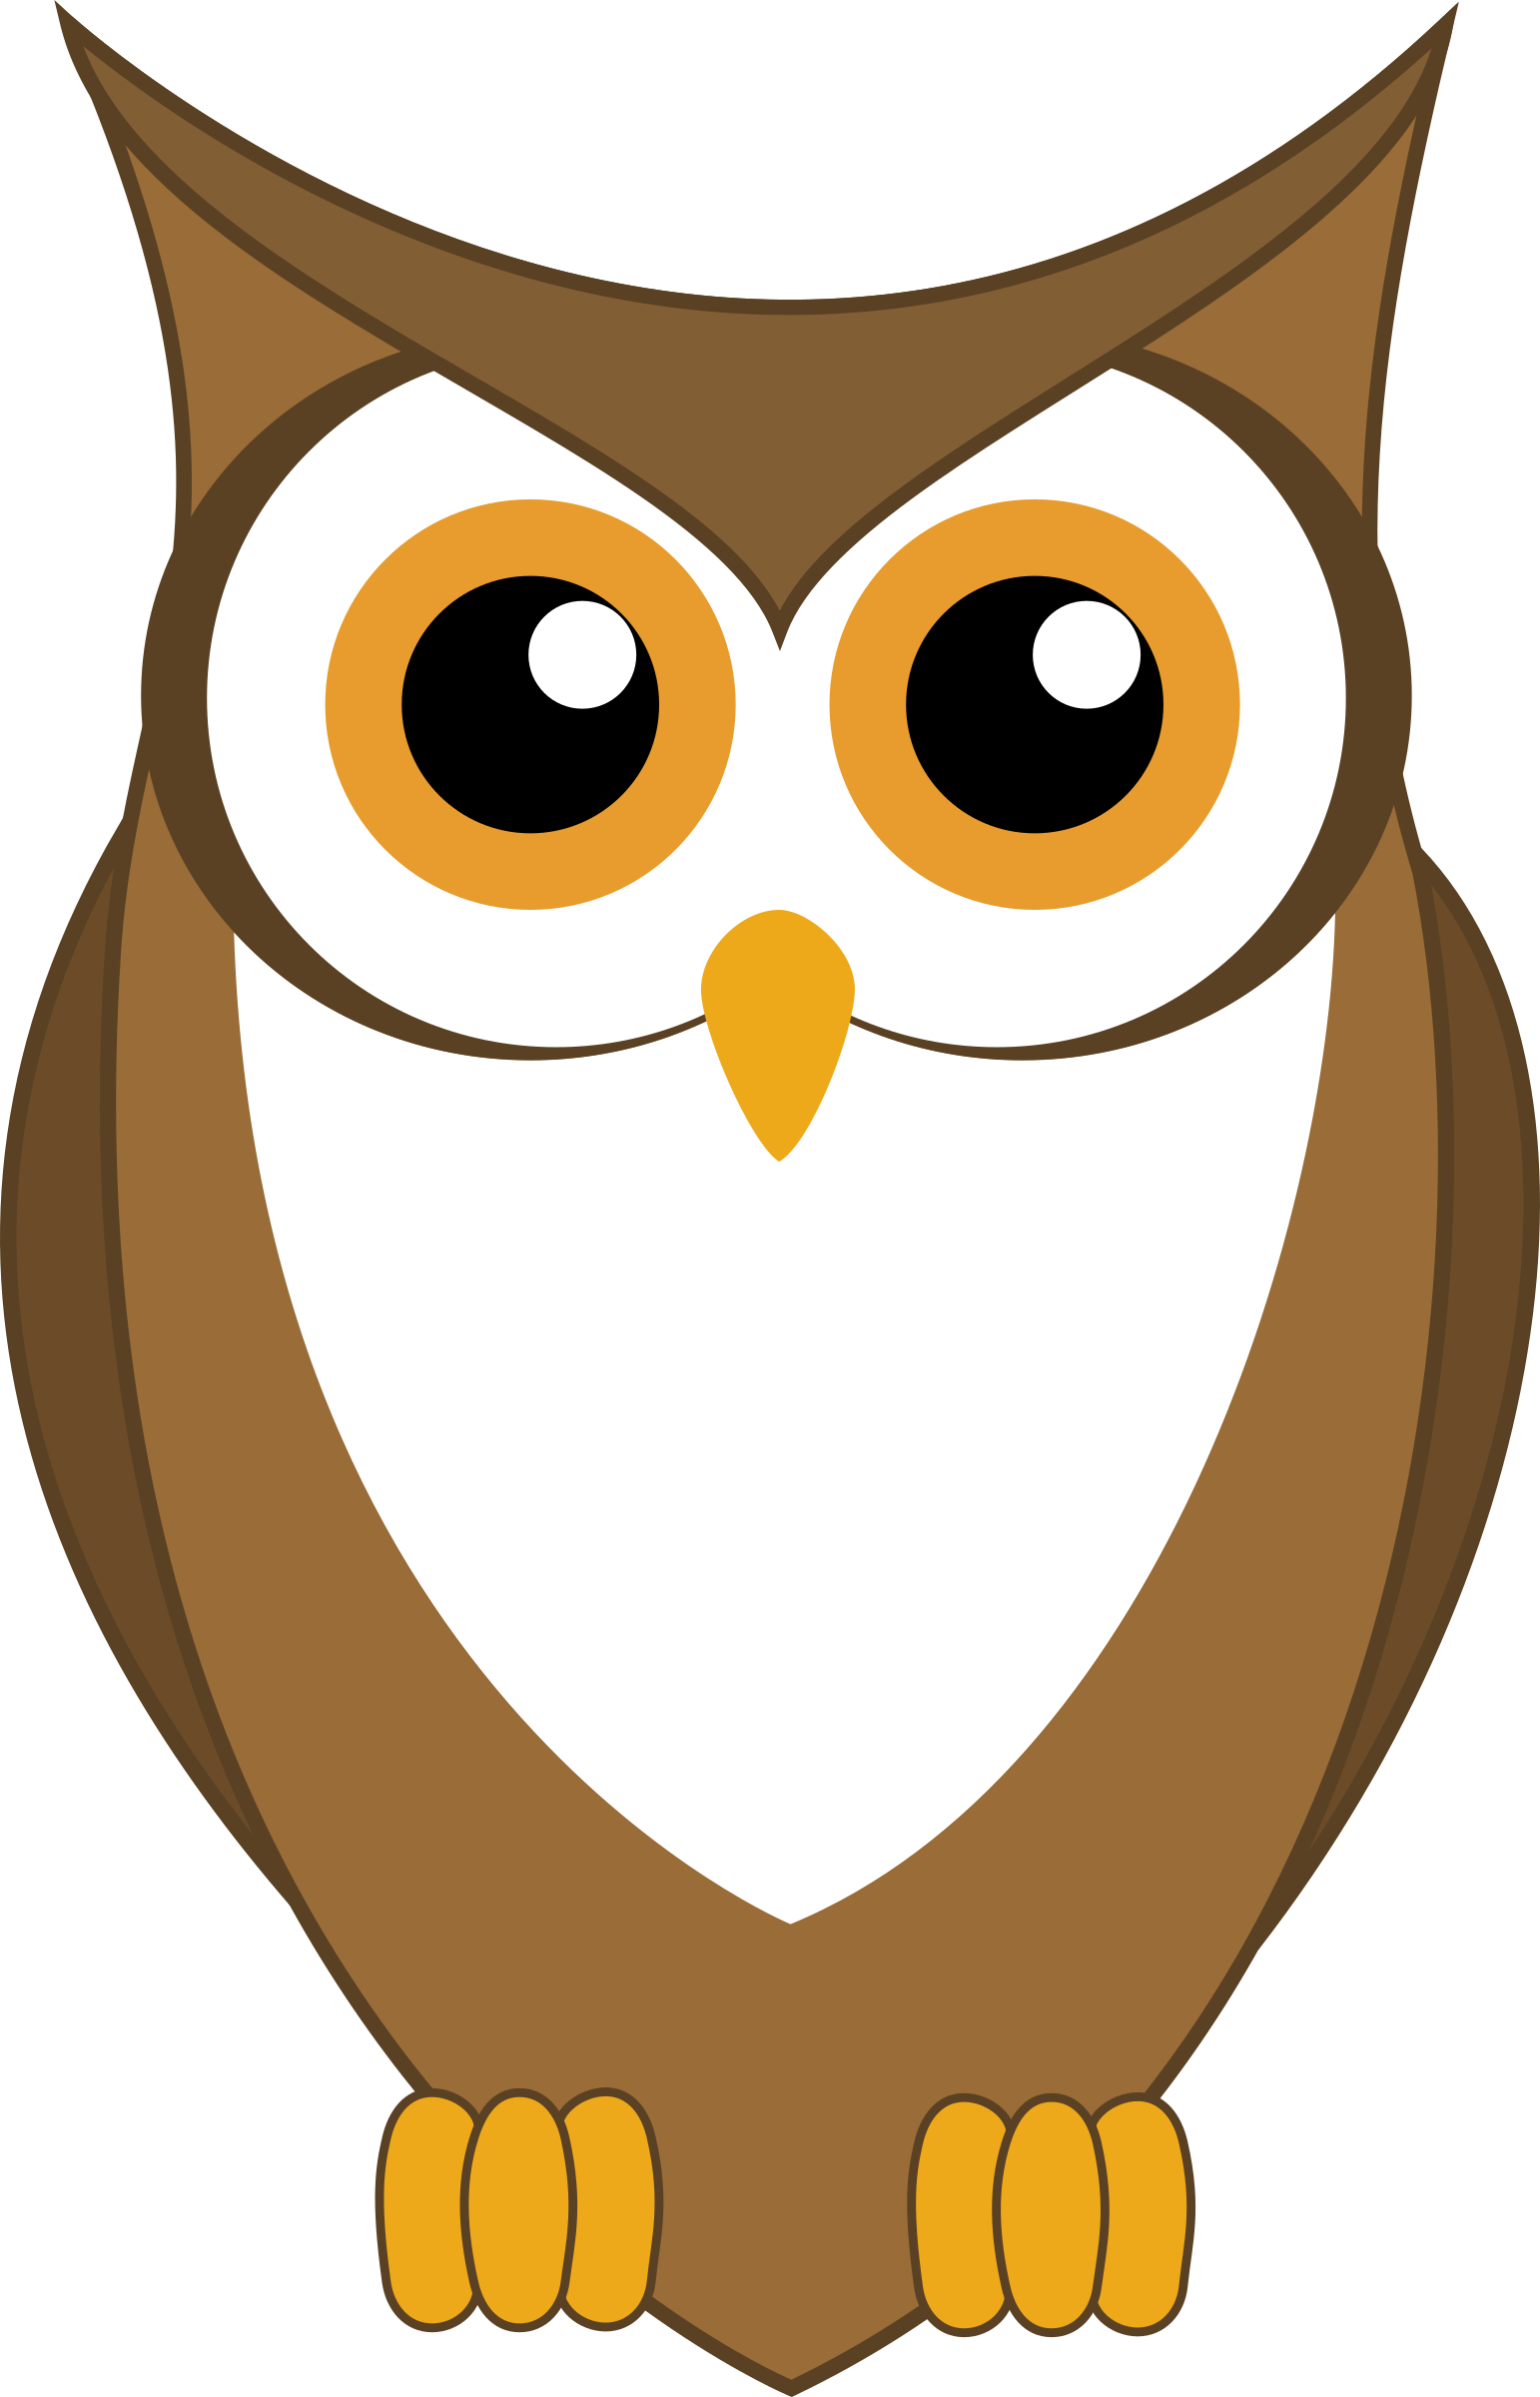 owl vector by maiconfz animaci n y cartoon vector pinterest owl rh pinterest com vector owners manual vector owner site